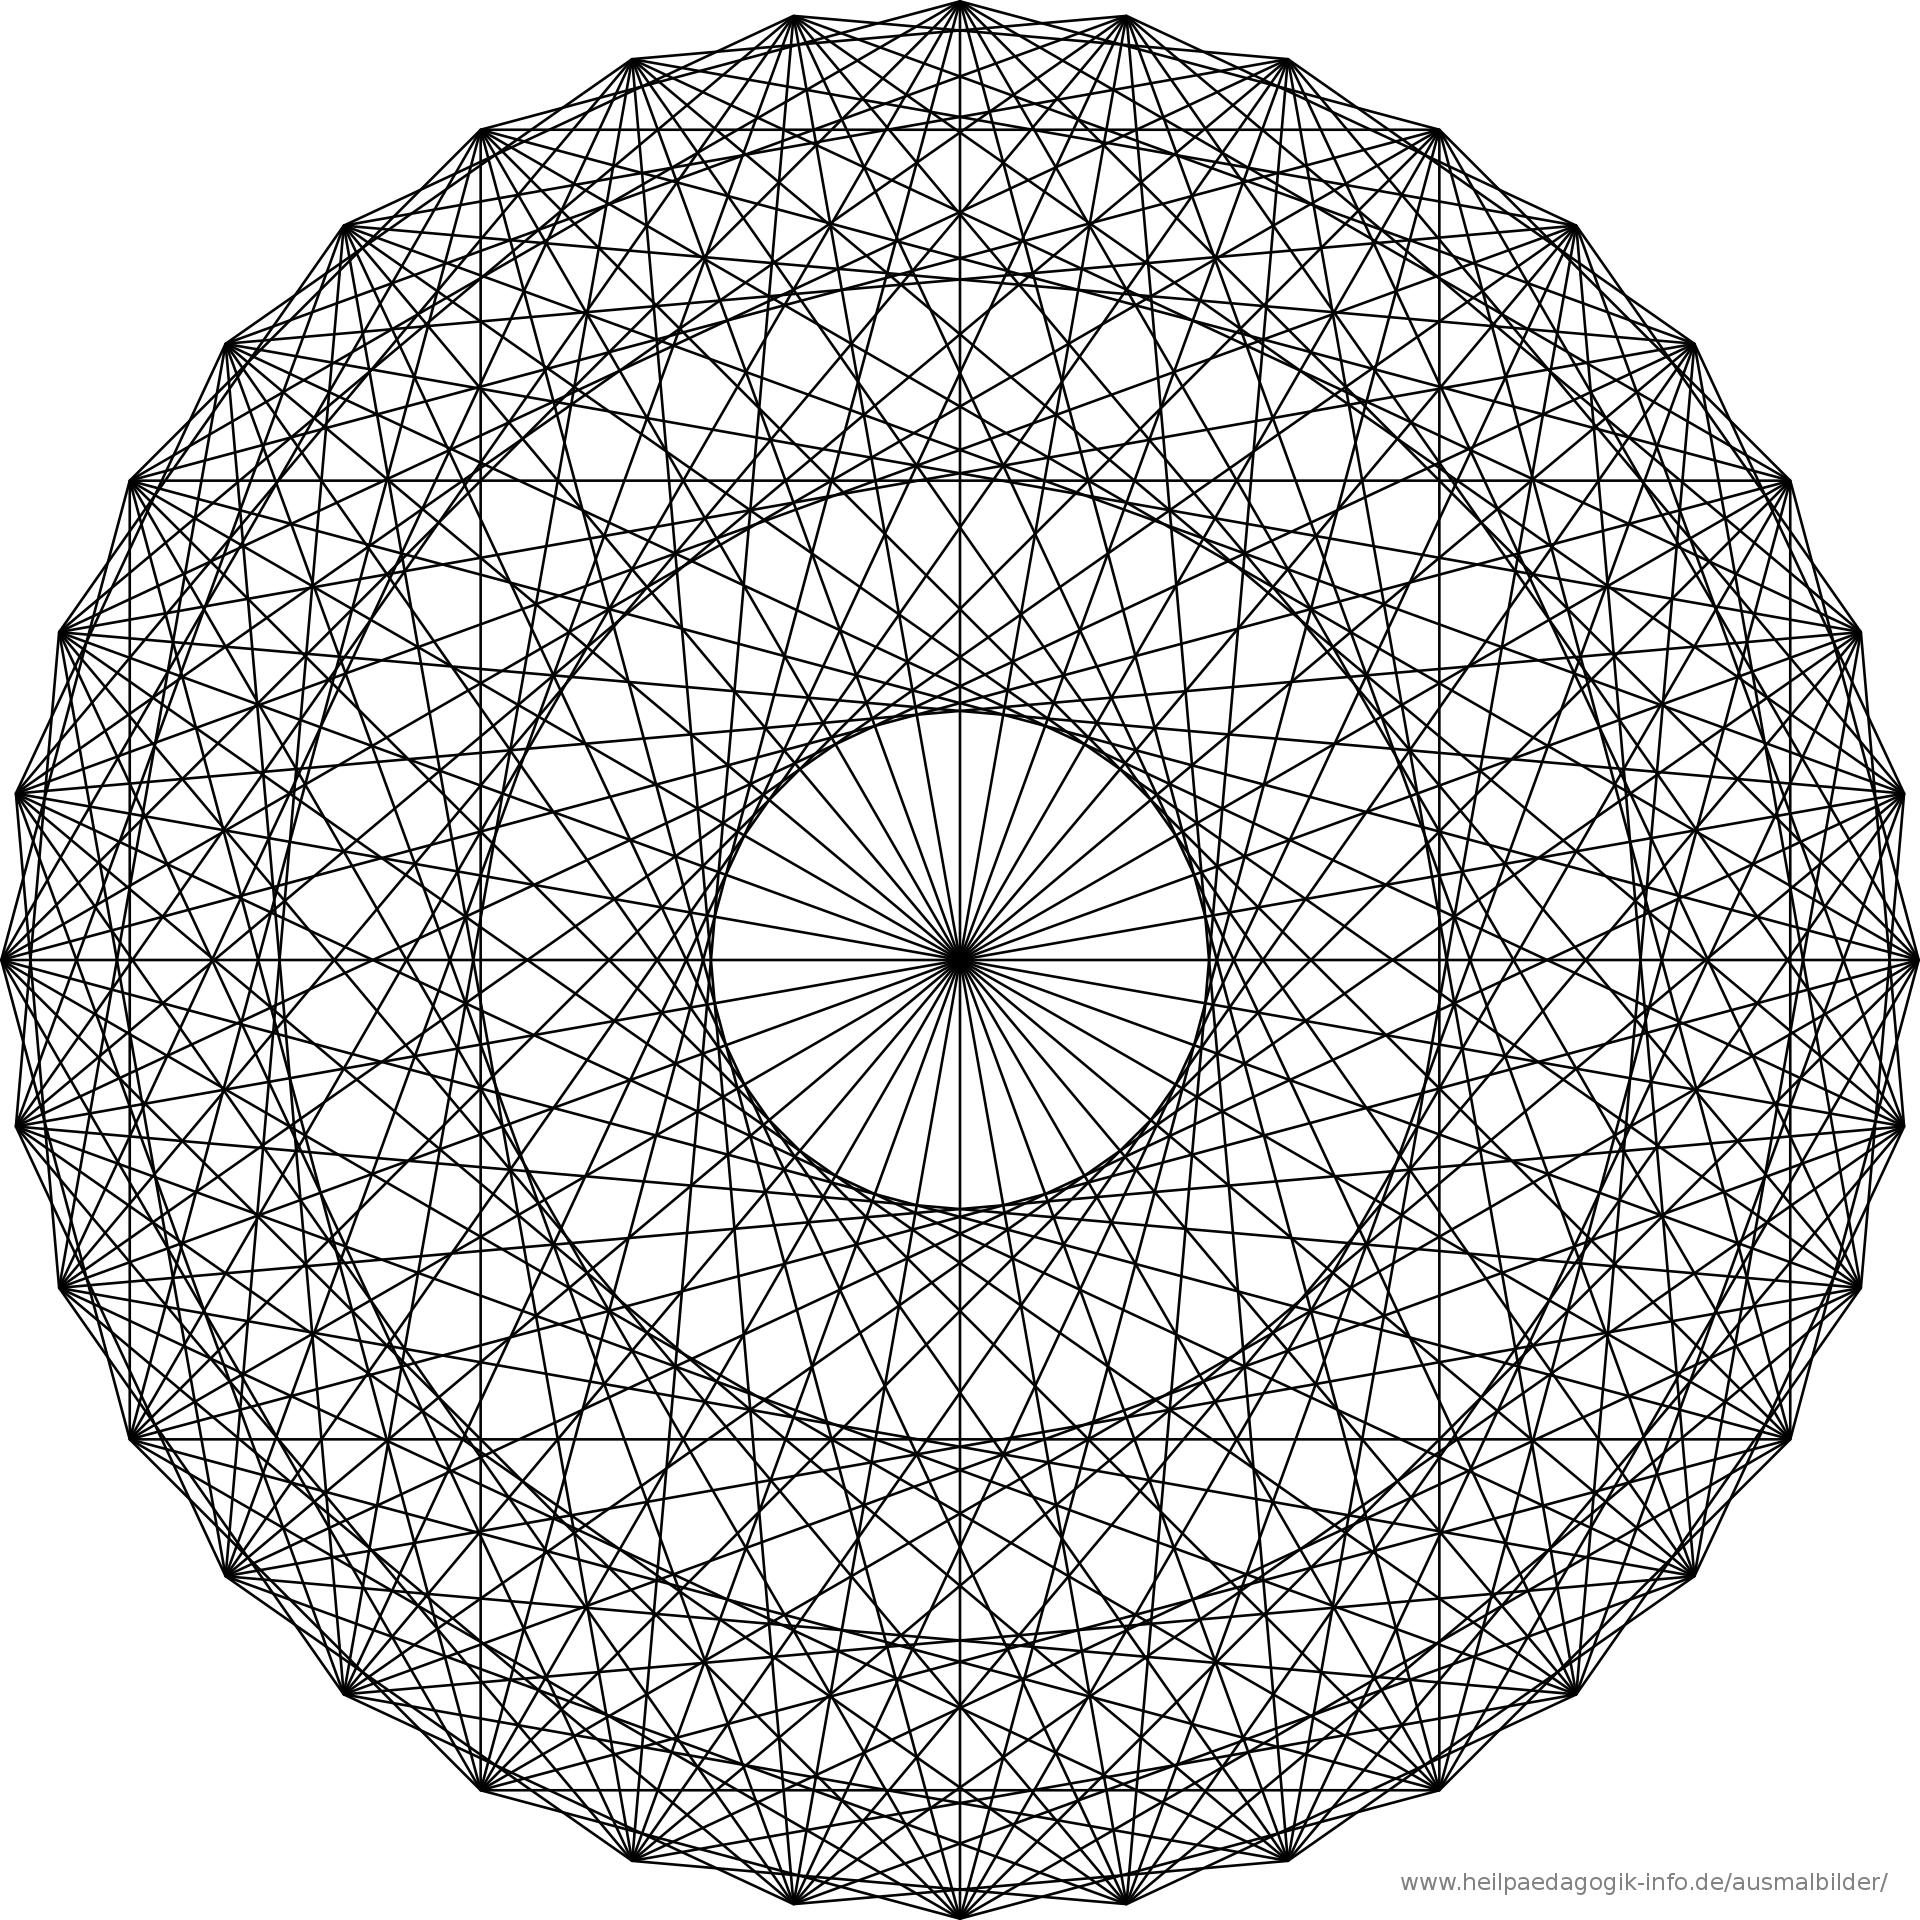 malvorlage mandala | ausmalbilder | Pinterest | Malvorlagen mandala ...